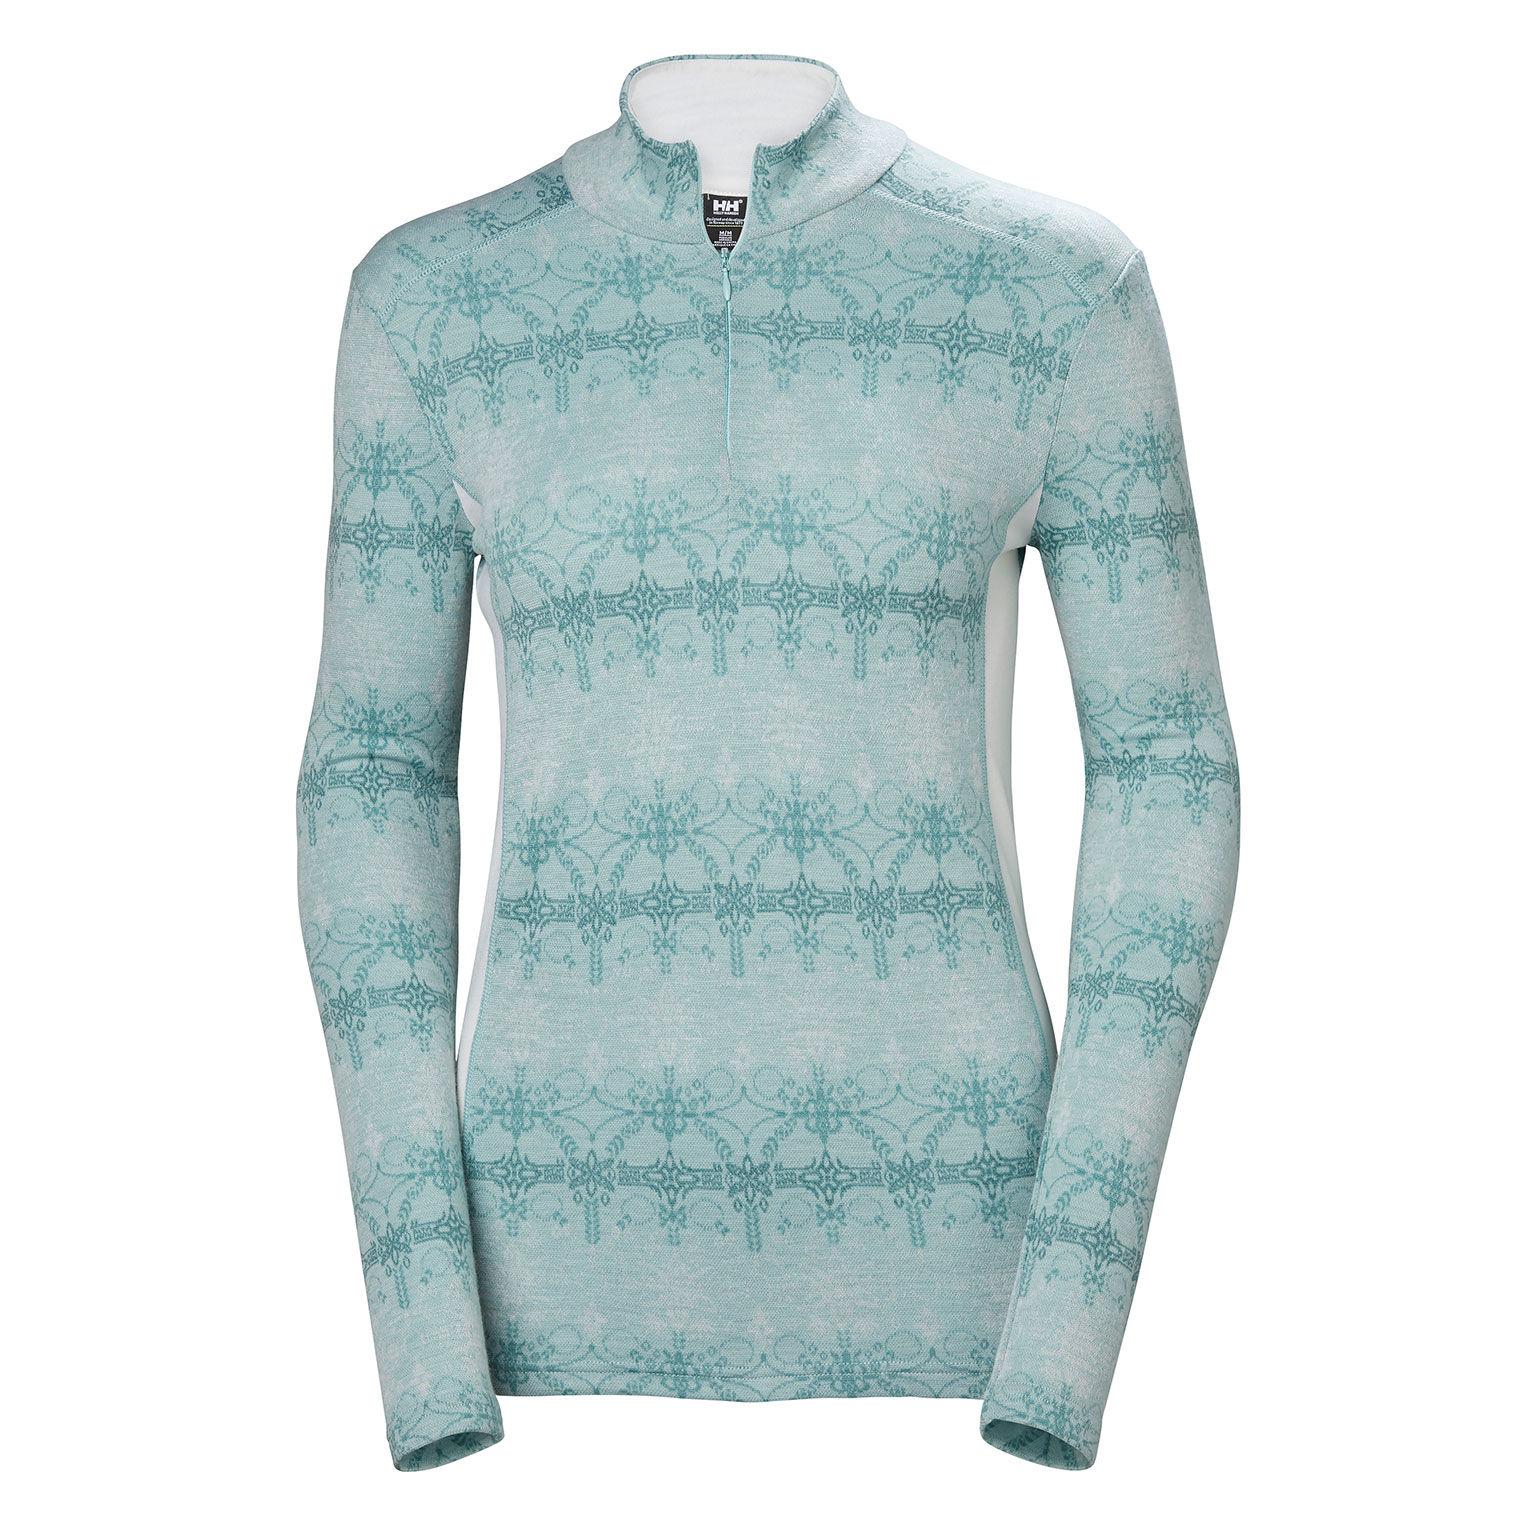 Comprar Helly Hansen T-Shirt termica turchese W HH Merino MID